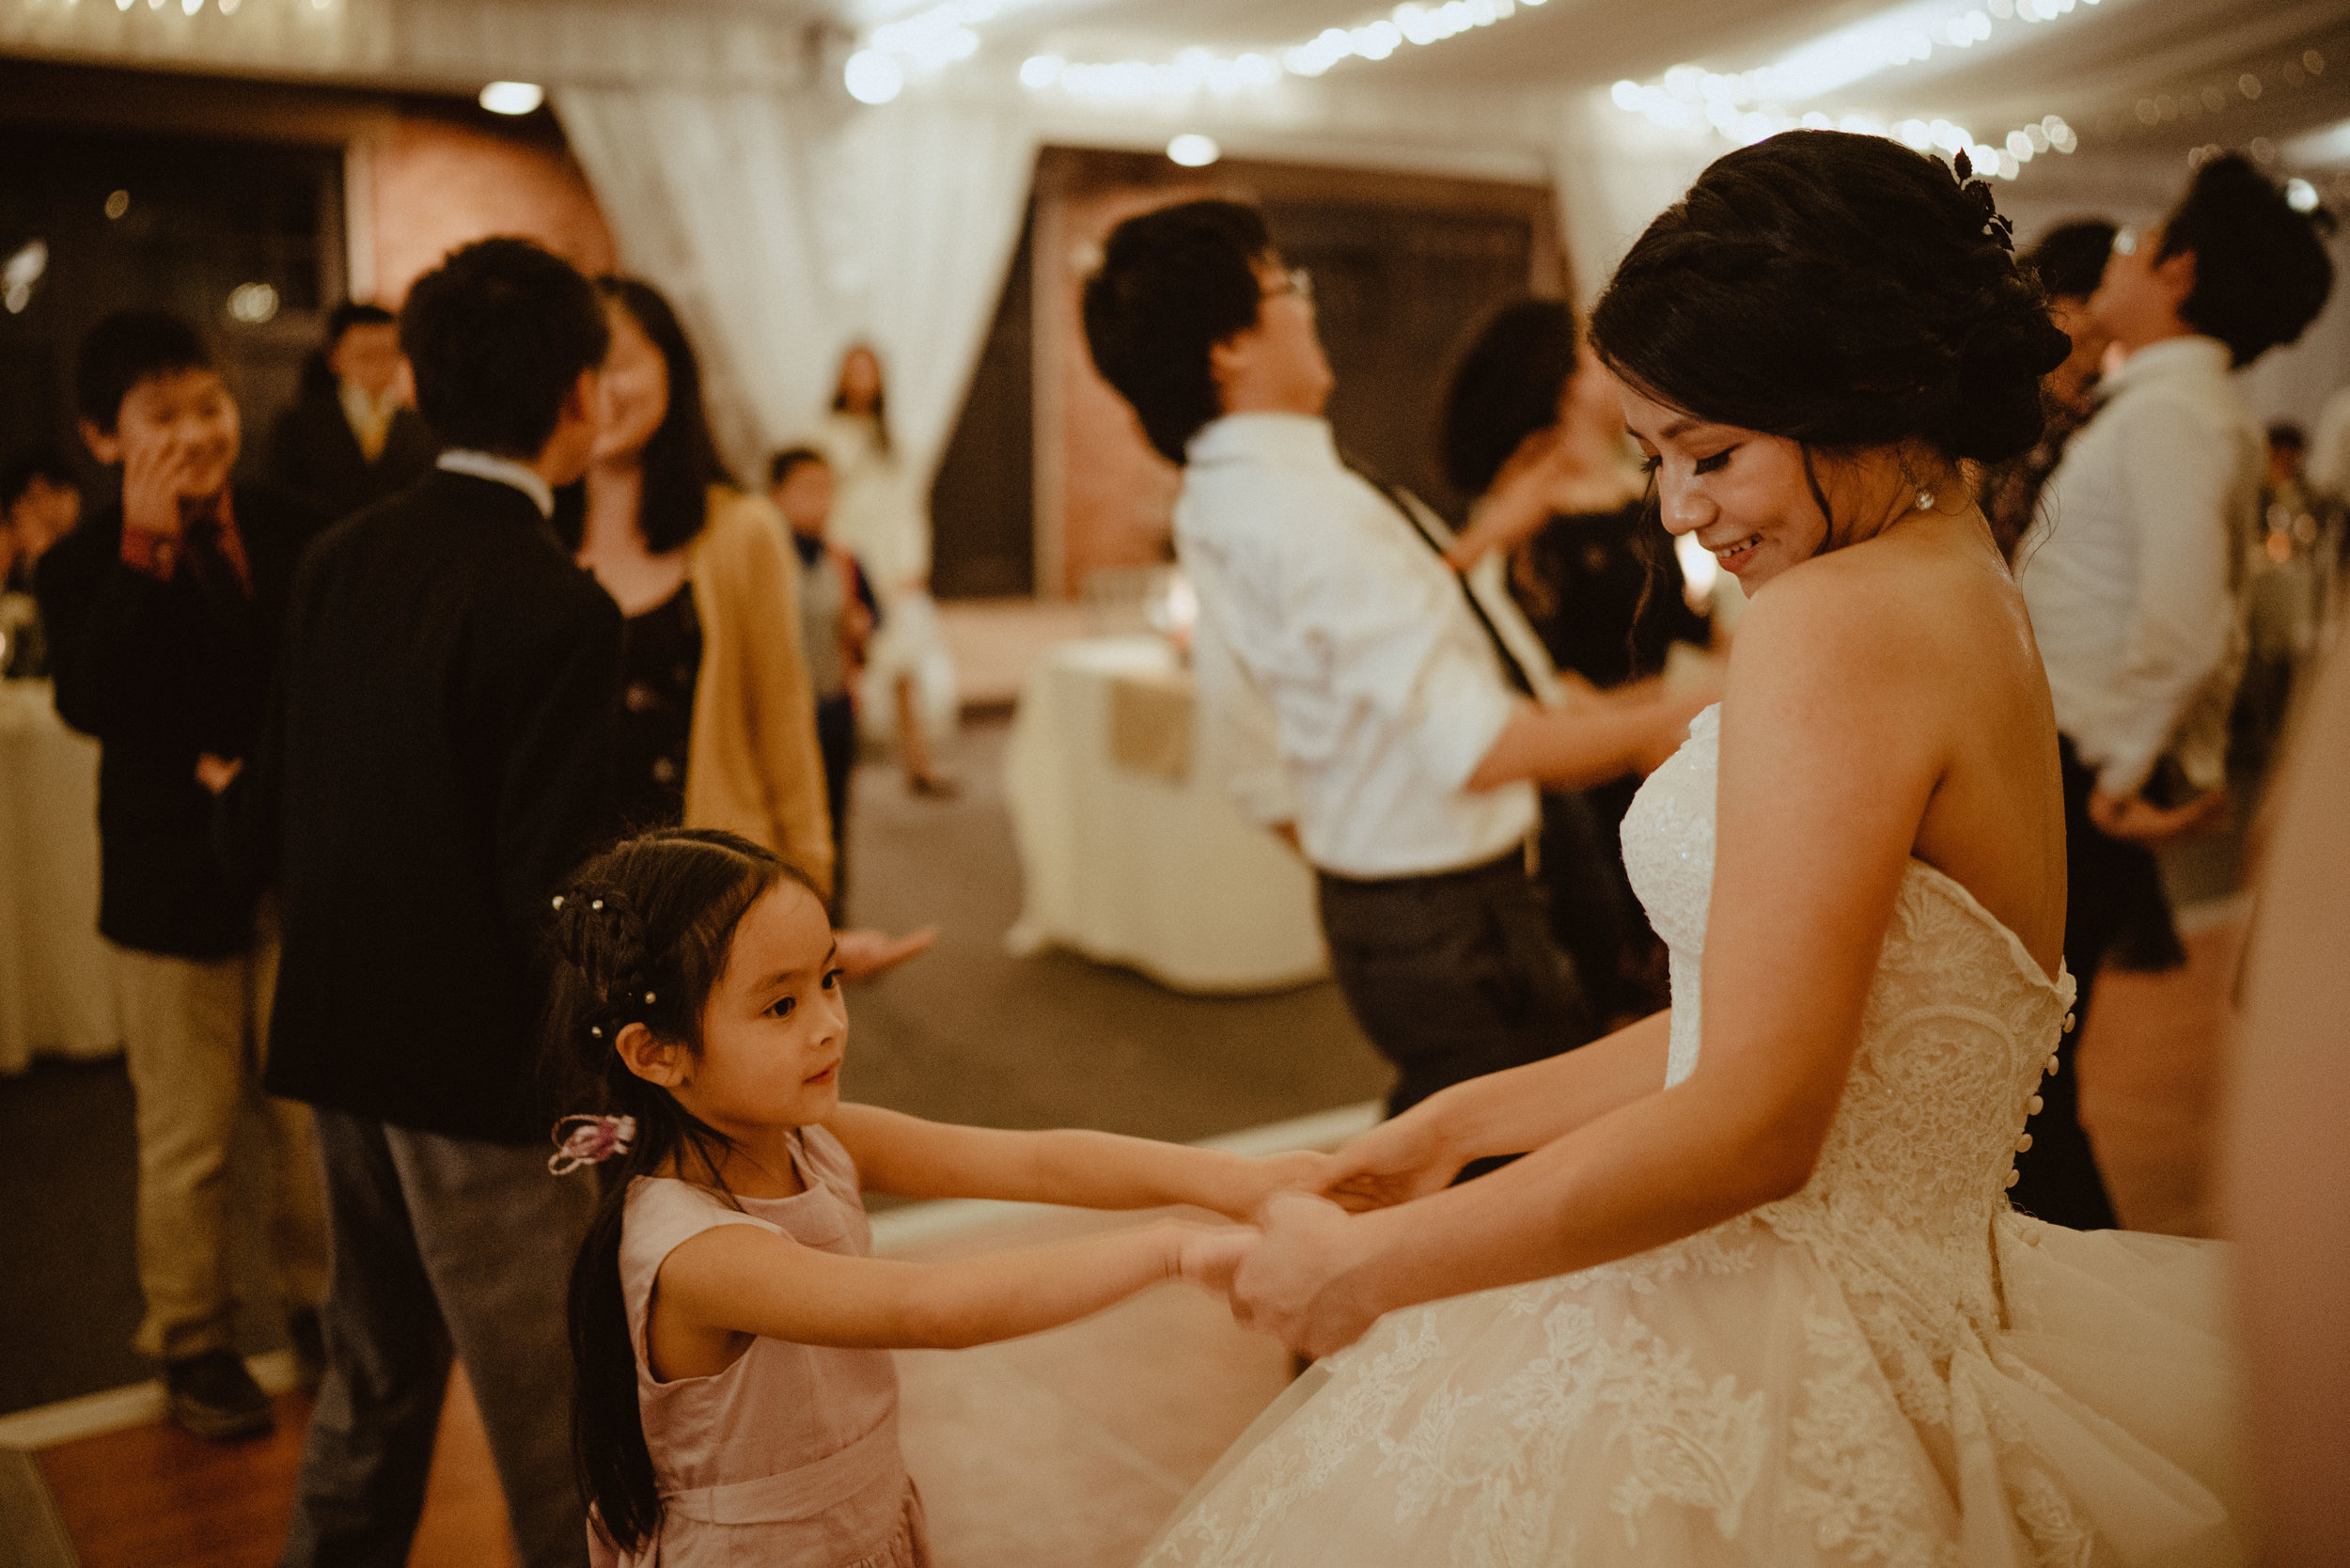 Irene-and-Jae-2019_Brooklyn_Wedding_Photographer_Chellise_Michael_Photography--168.jpg